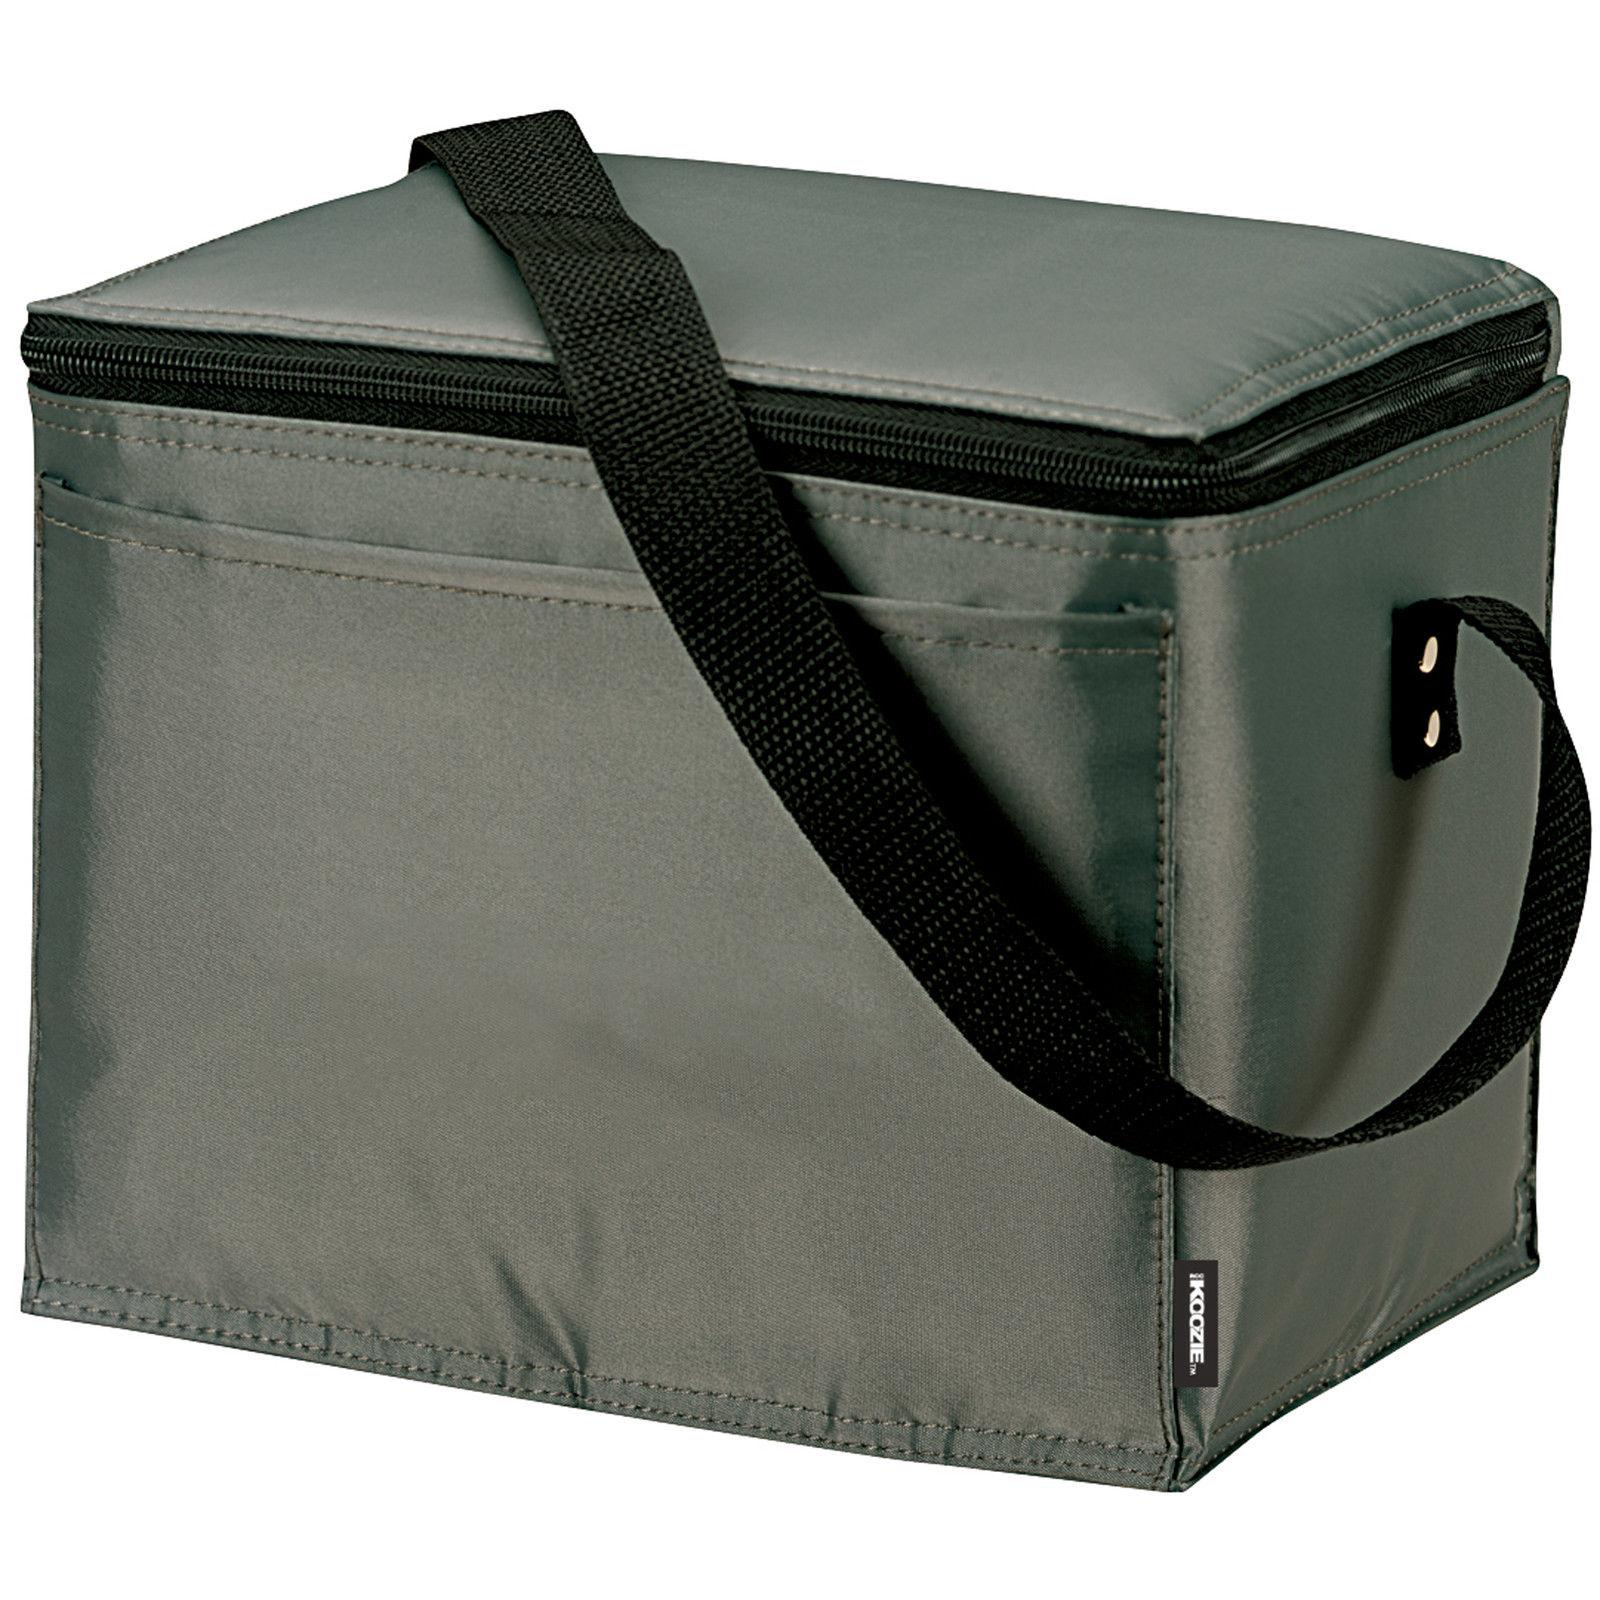 6 Pack Cooler ~ Koozie™ pack cooler lunch bag keep food and drinks